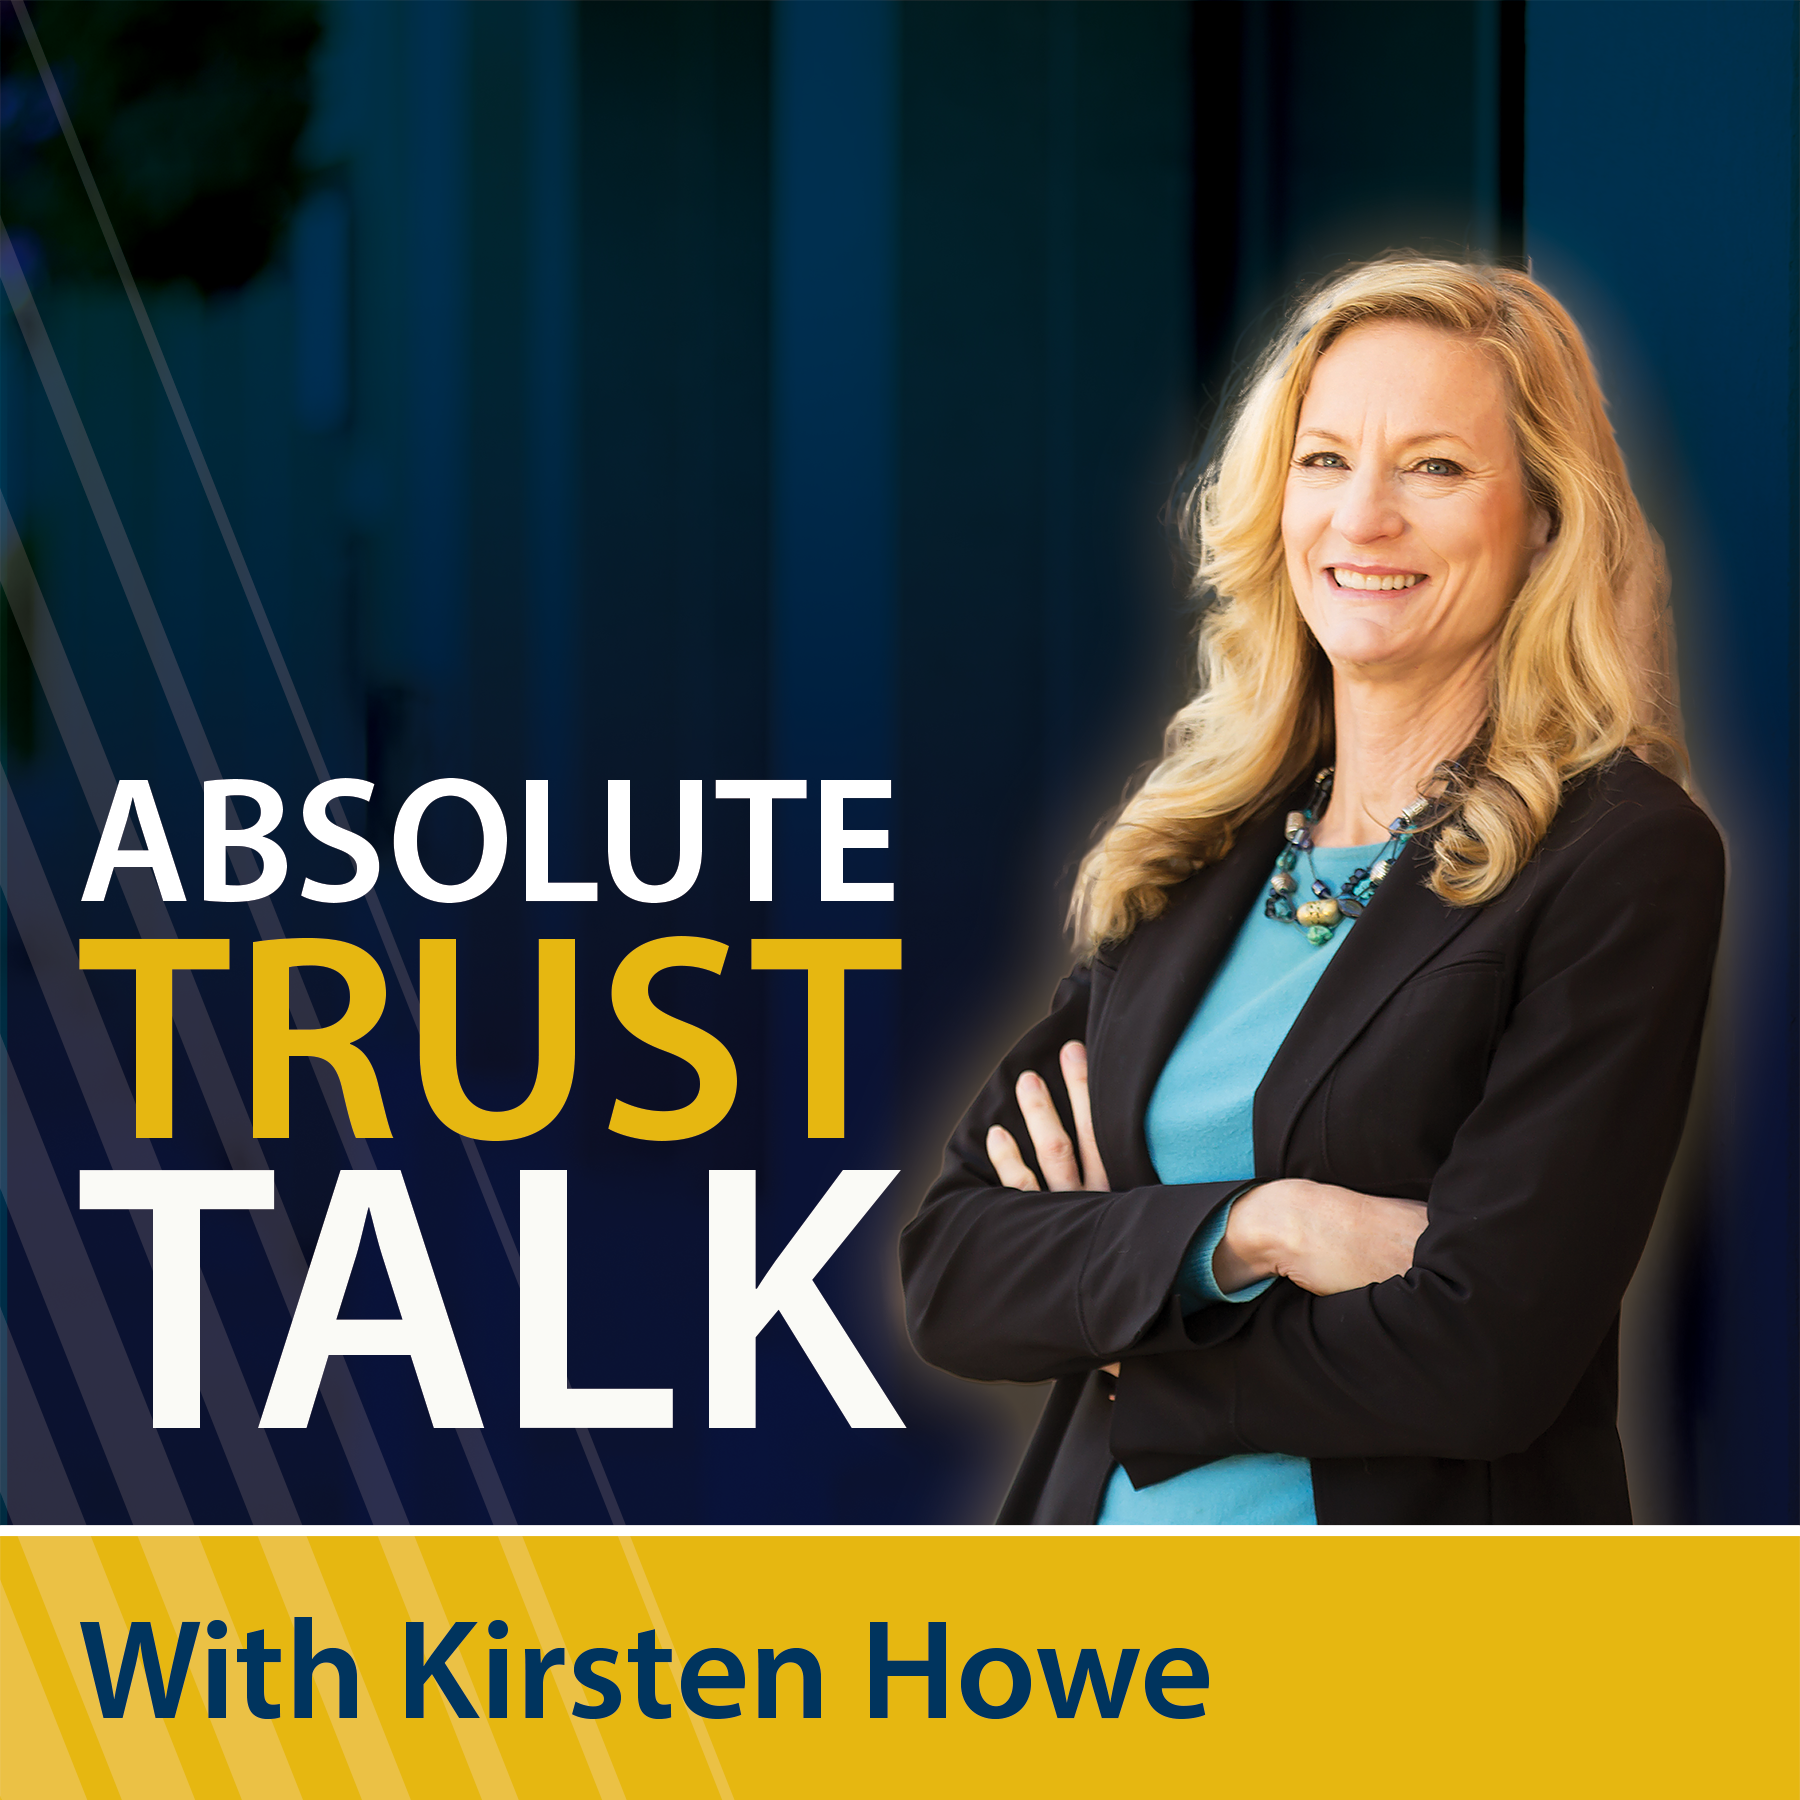 Absolute Trust Talk show art